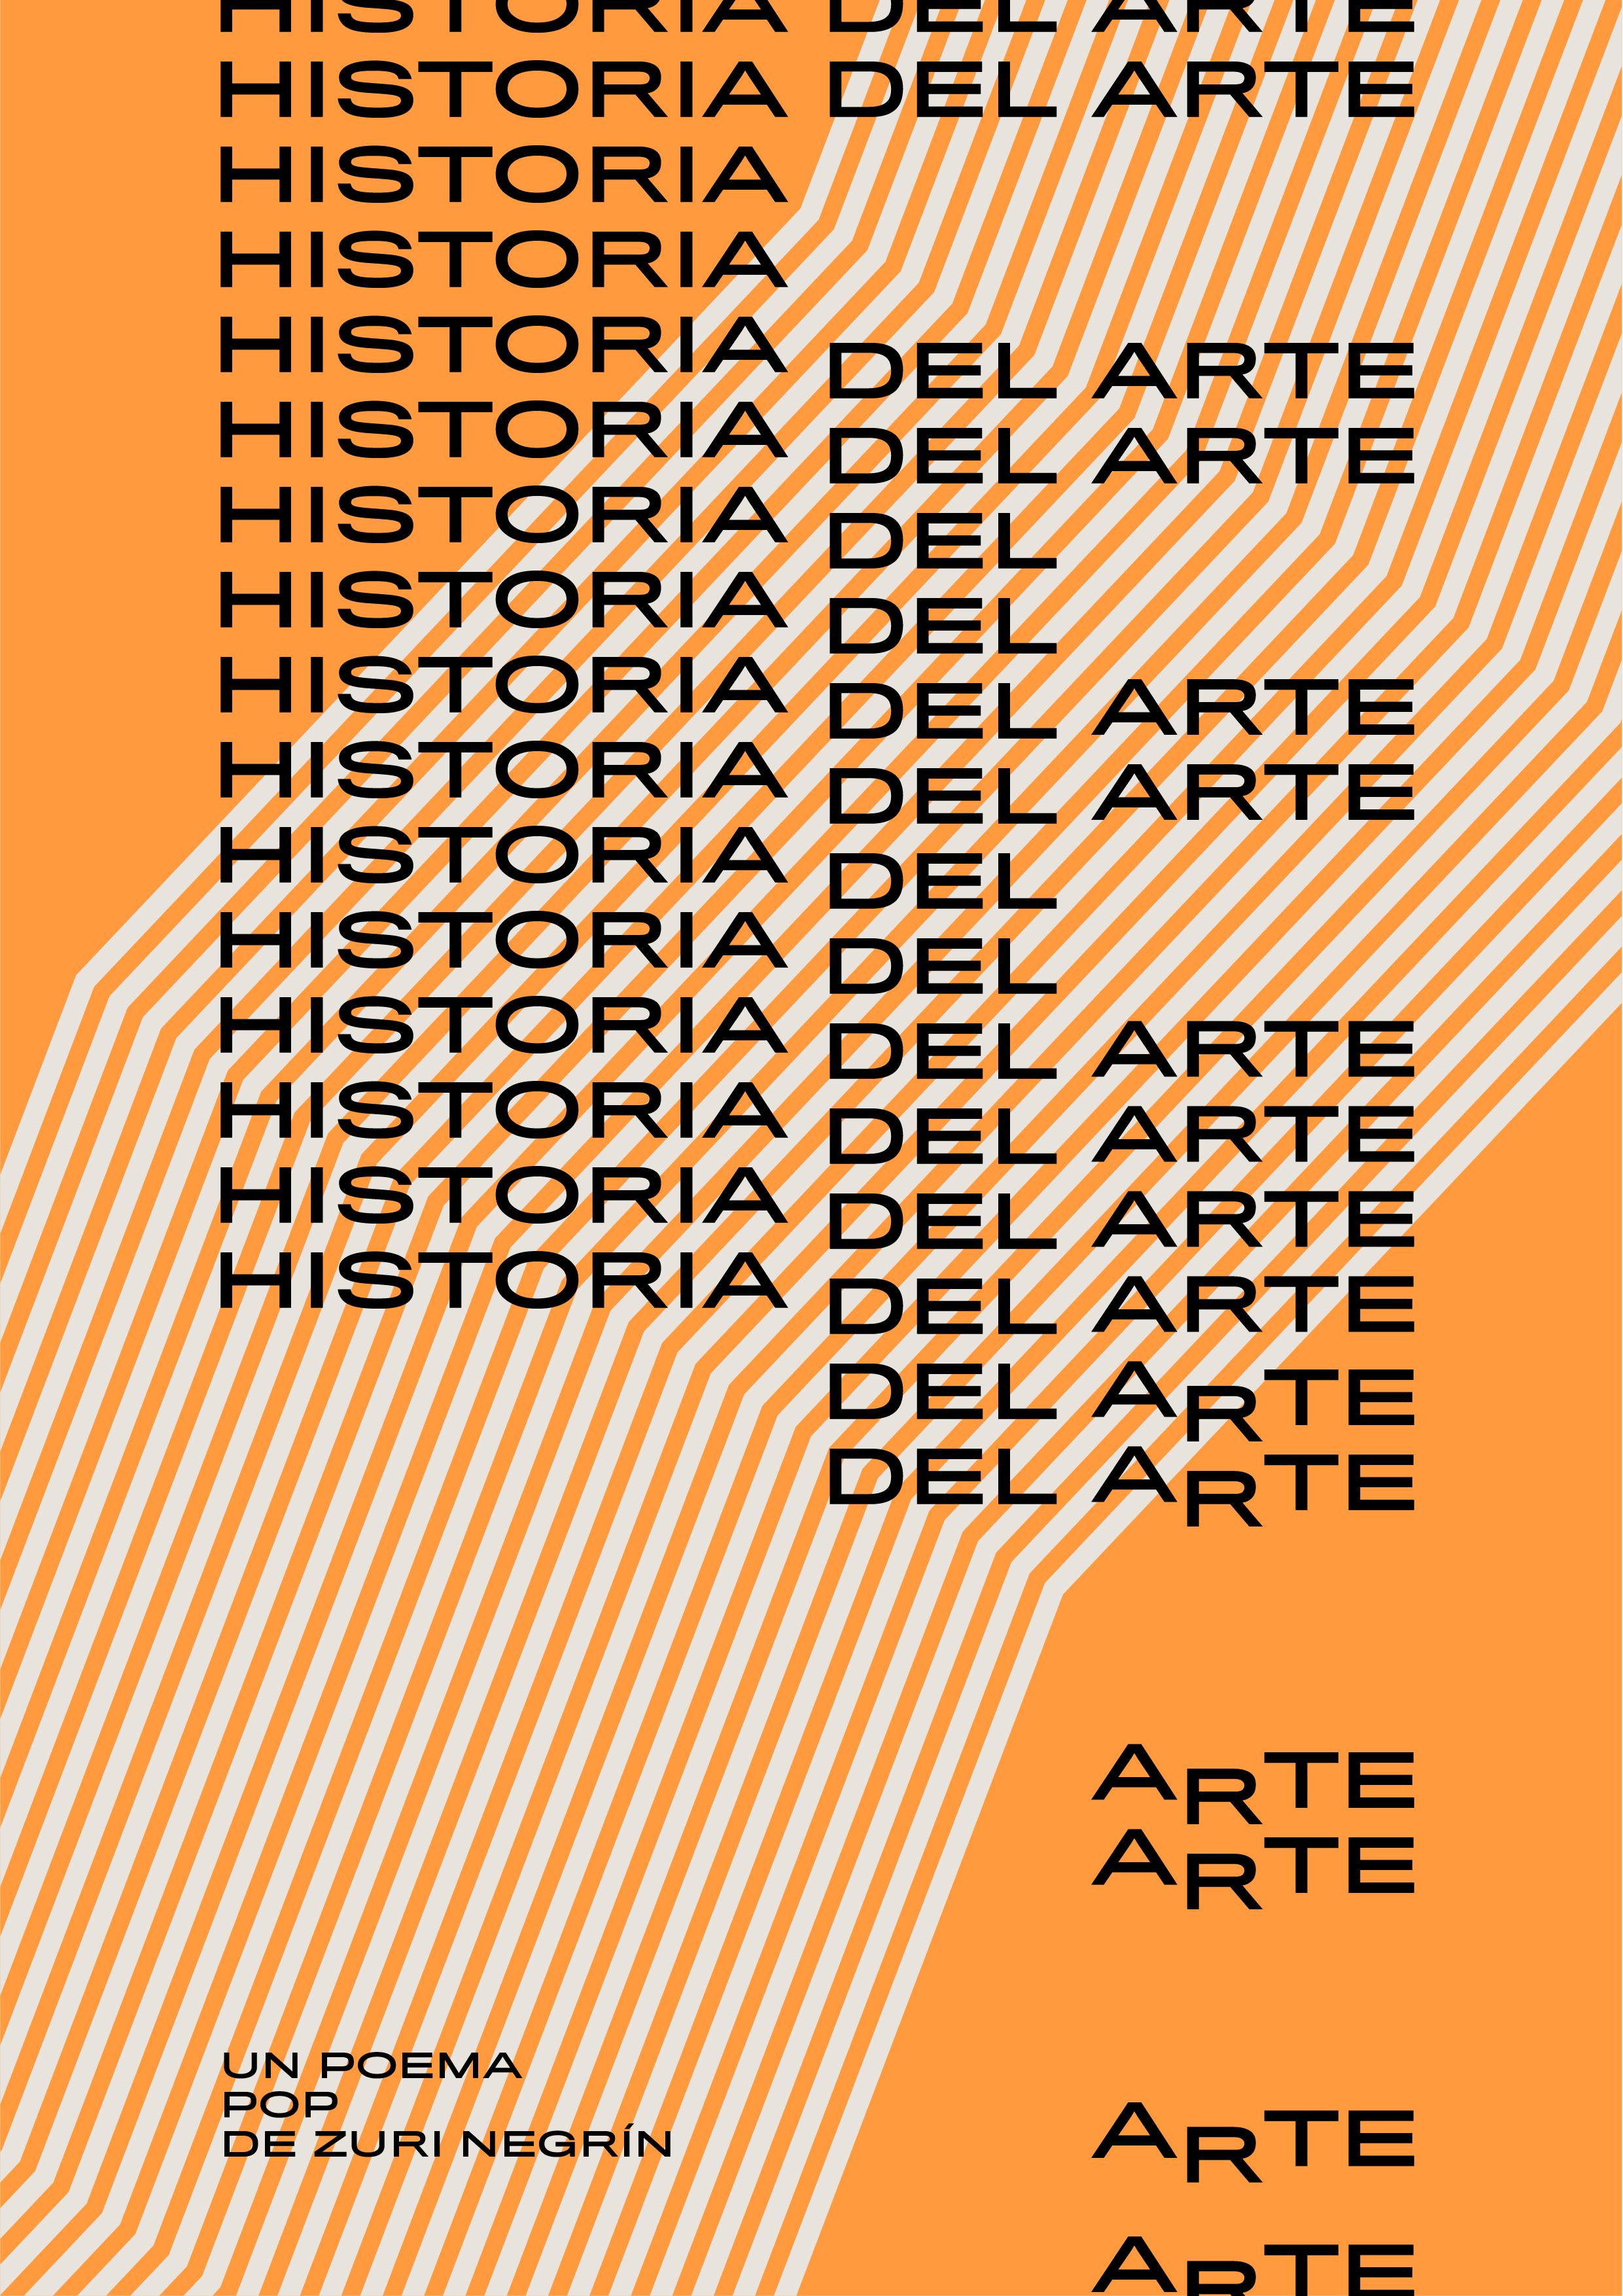 POP_02 Historia del arte